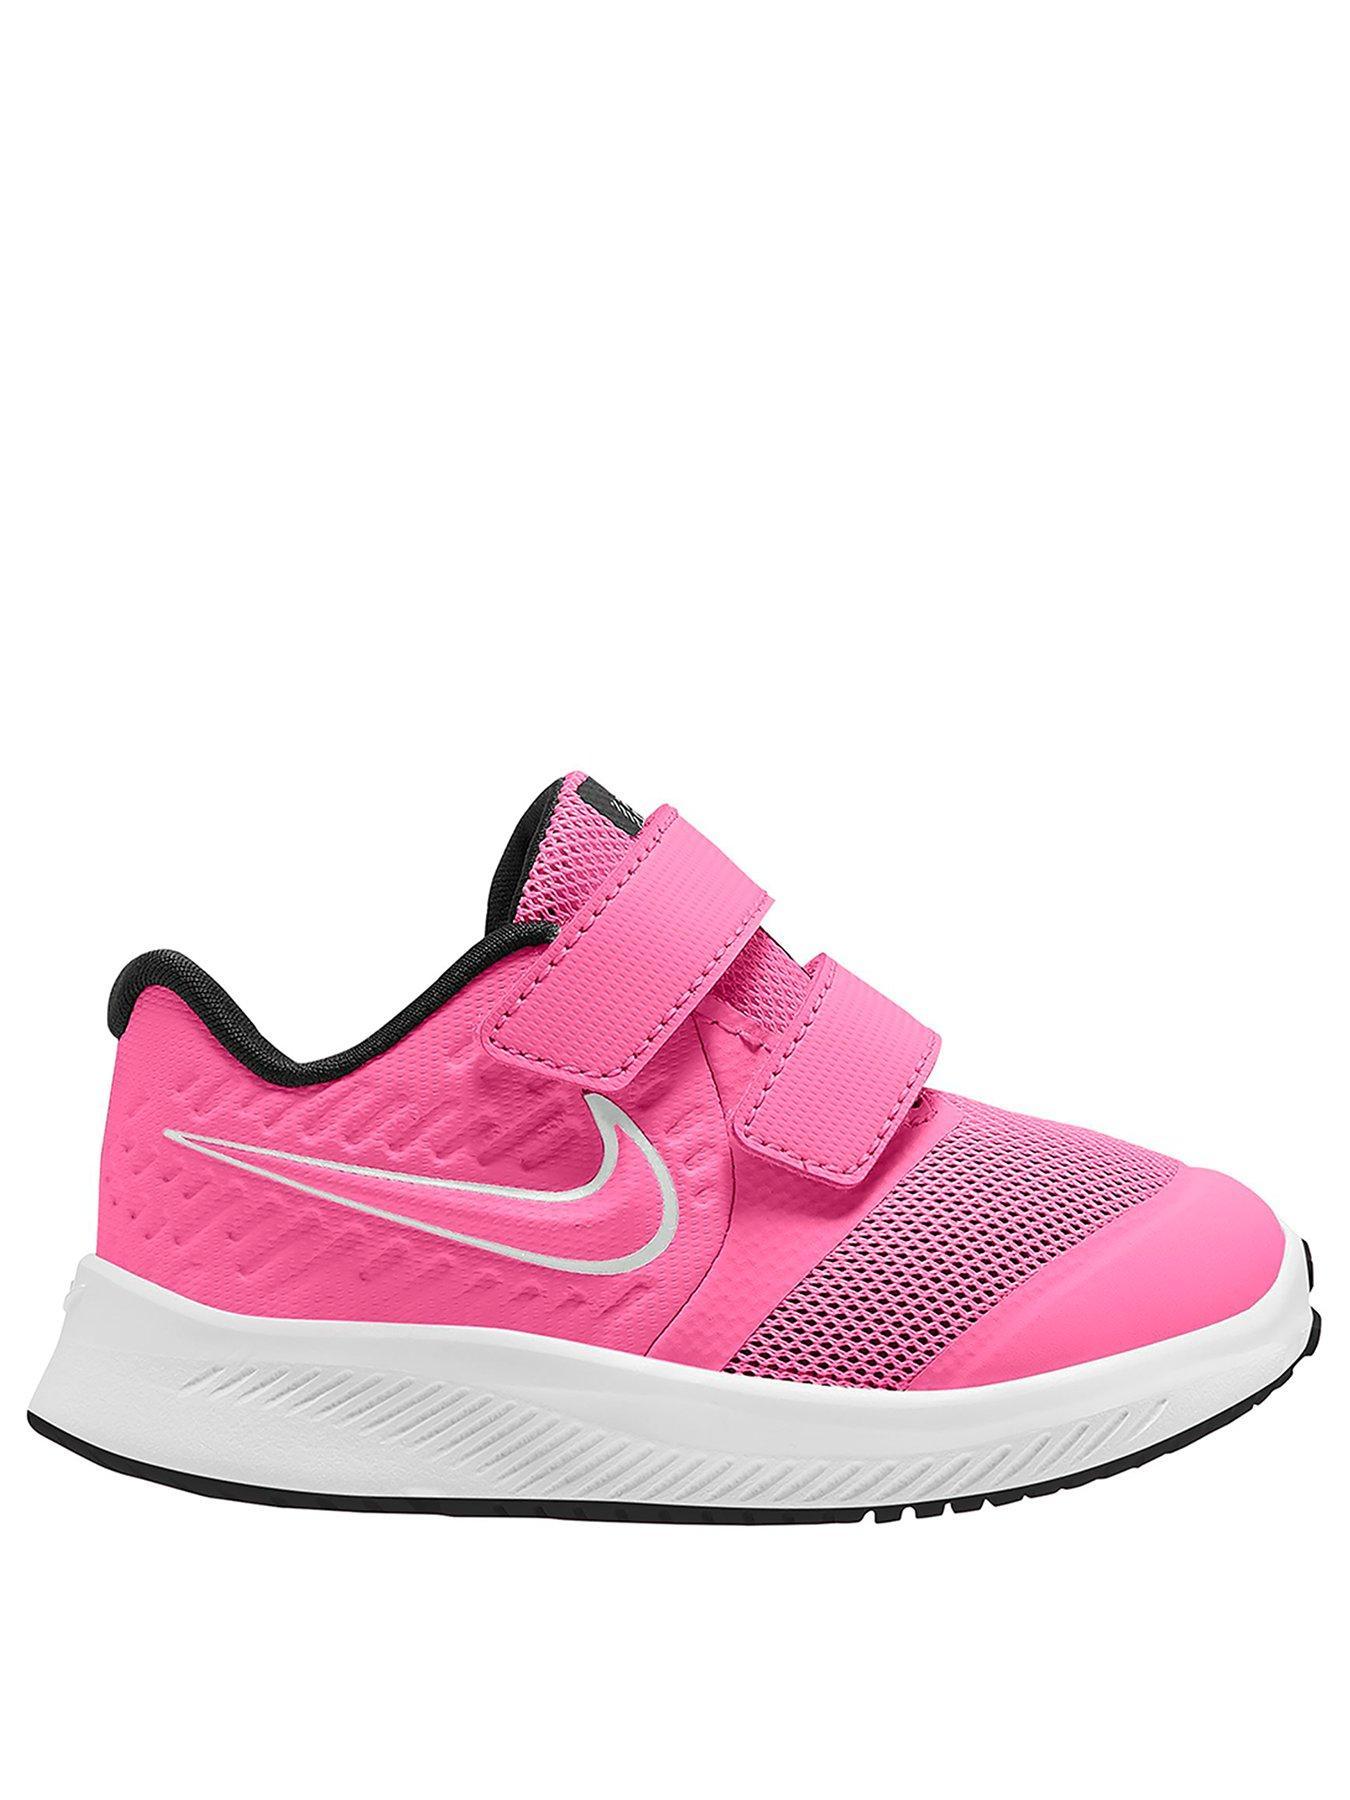 Pink | Trainers | Child \u0026 baby | Nike